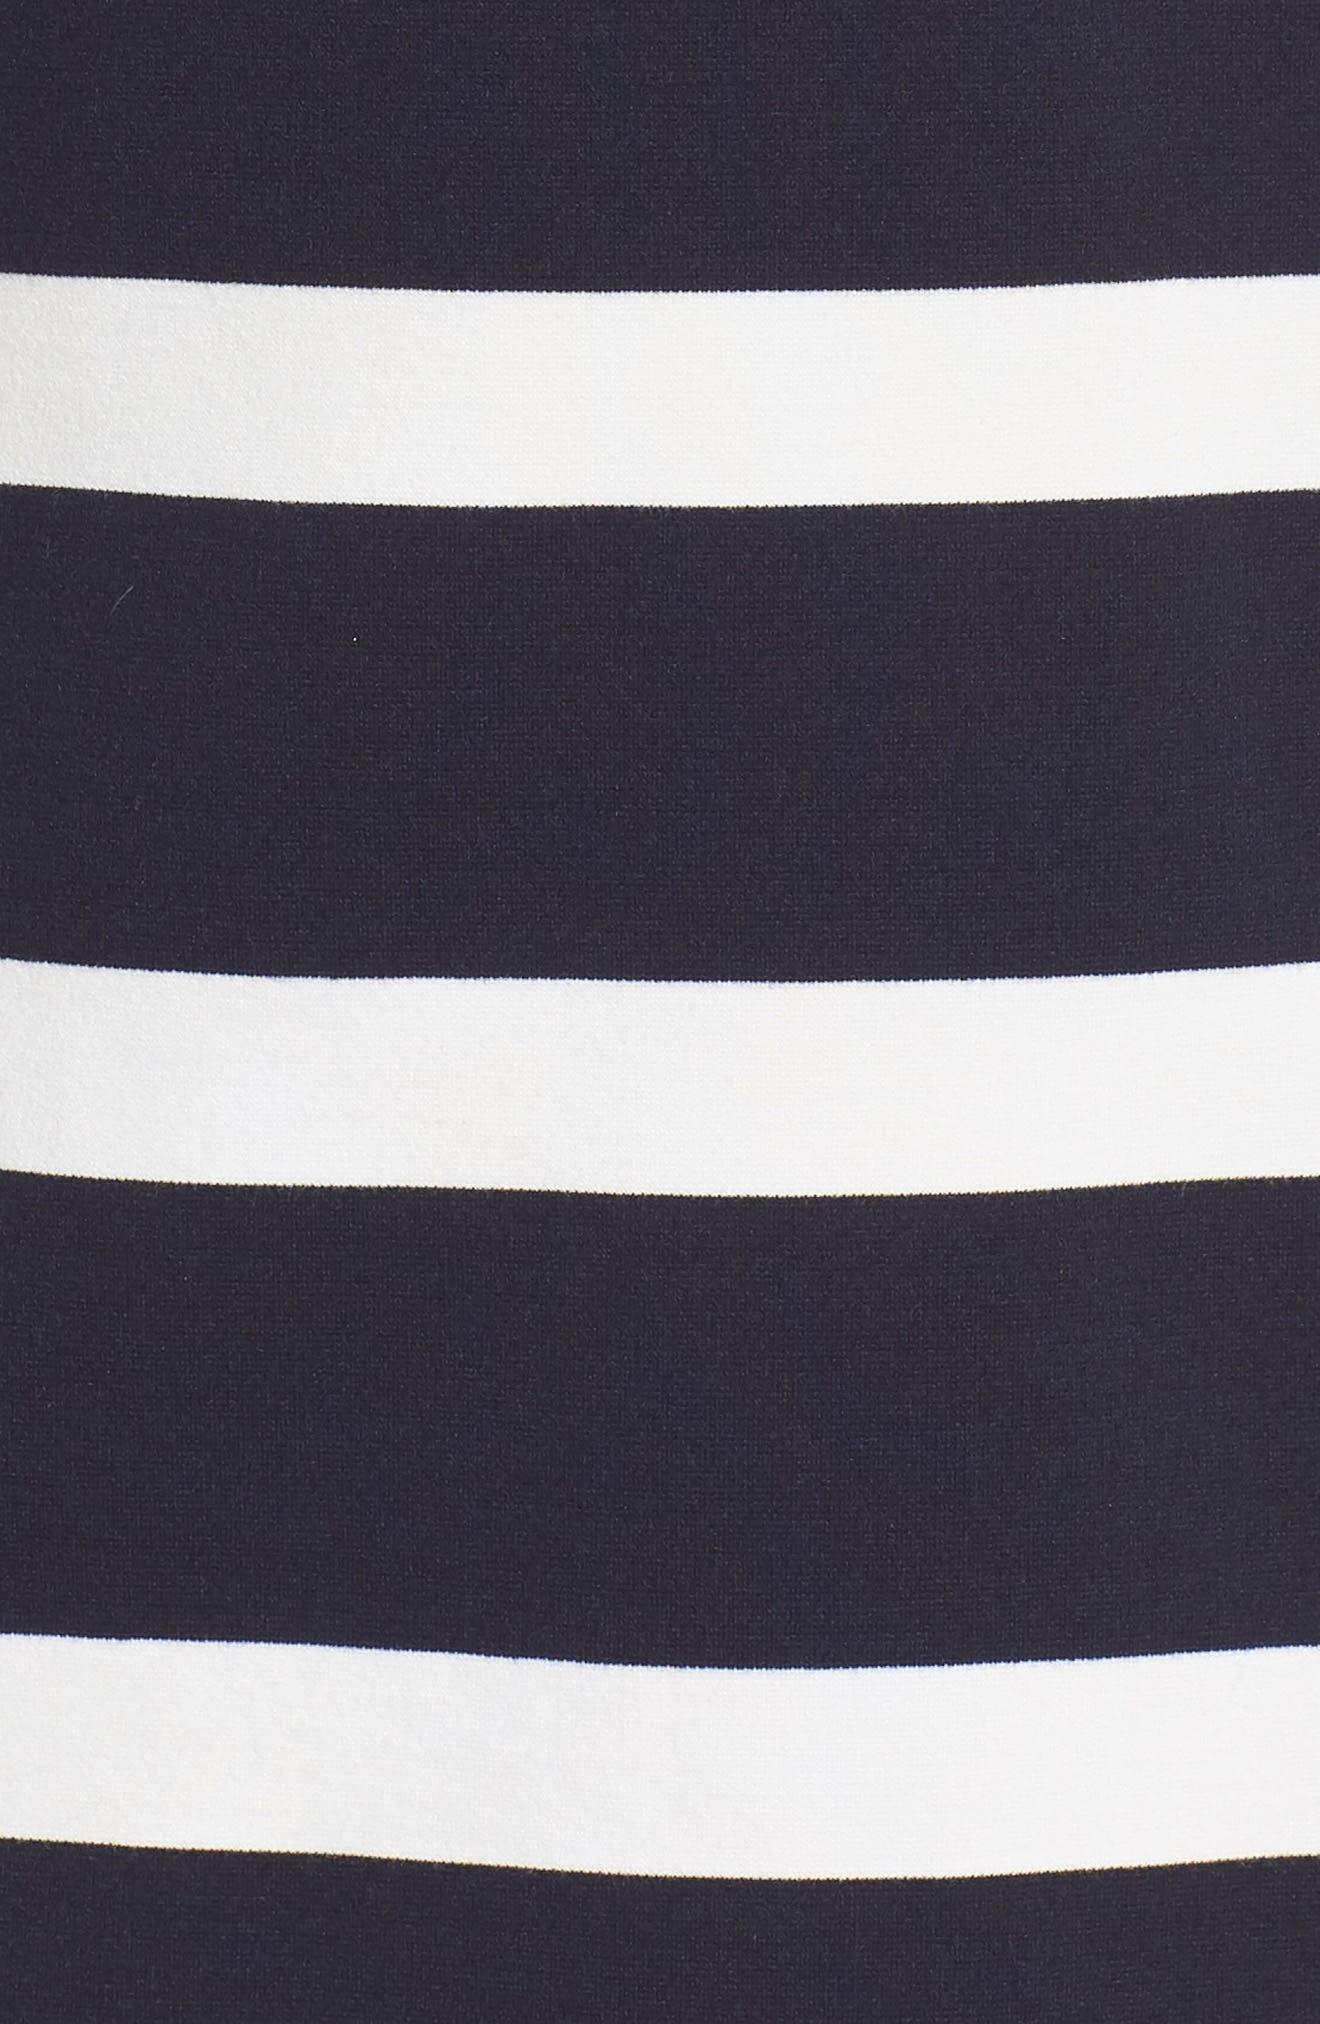 Stripe Balloon Sleeve Shift Dress,                             Alternate thumbnail 6, color,                             407